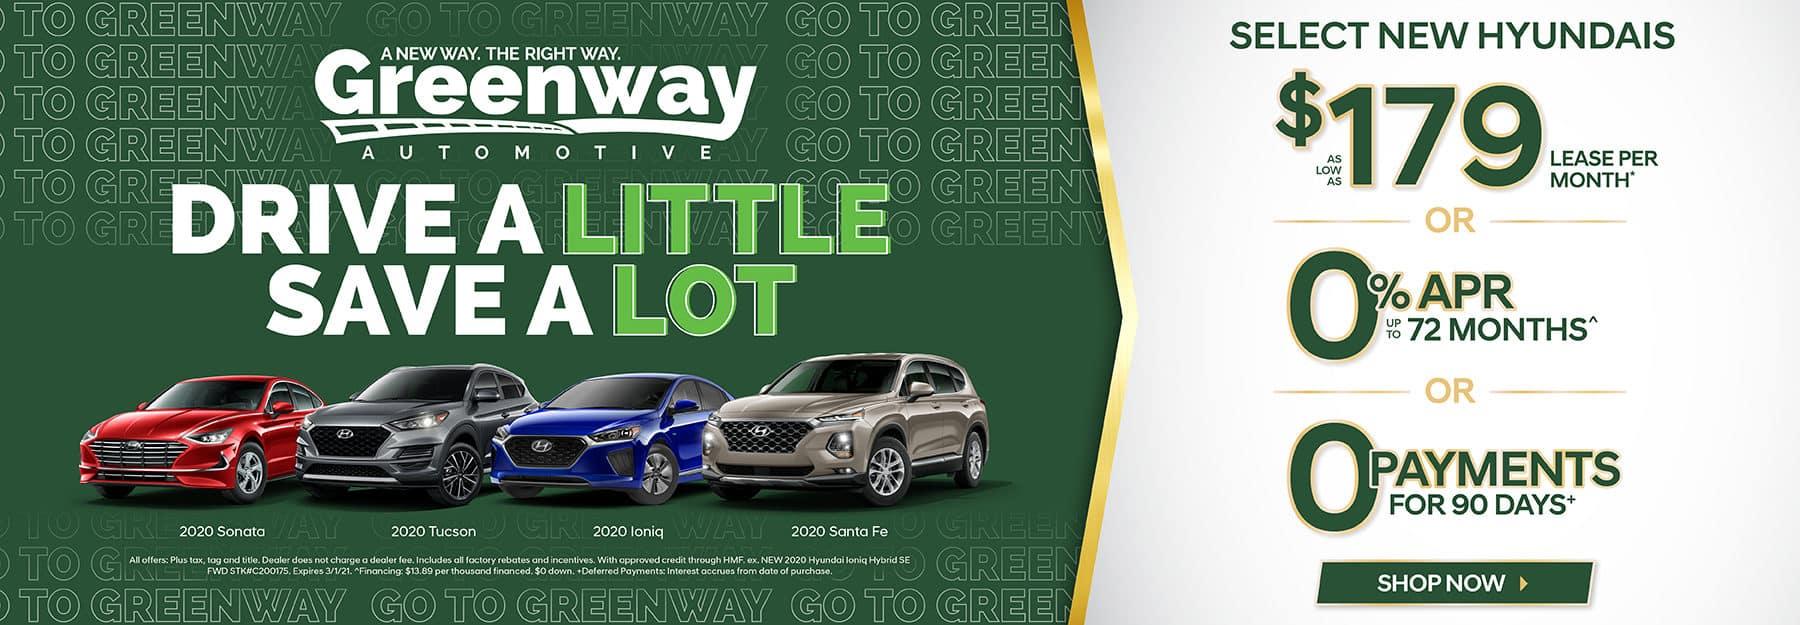 Select New Hyundais - Drive a Little Save a Lot!